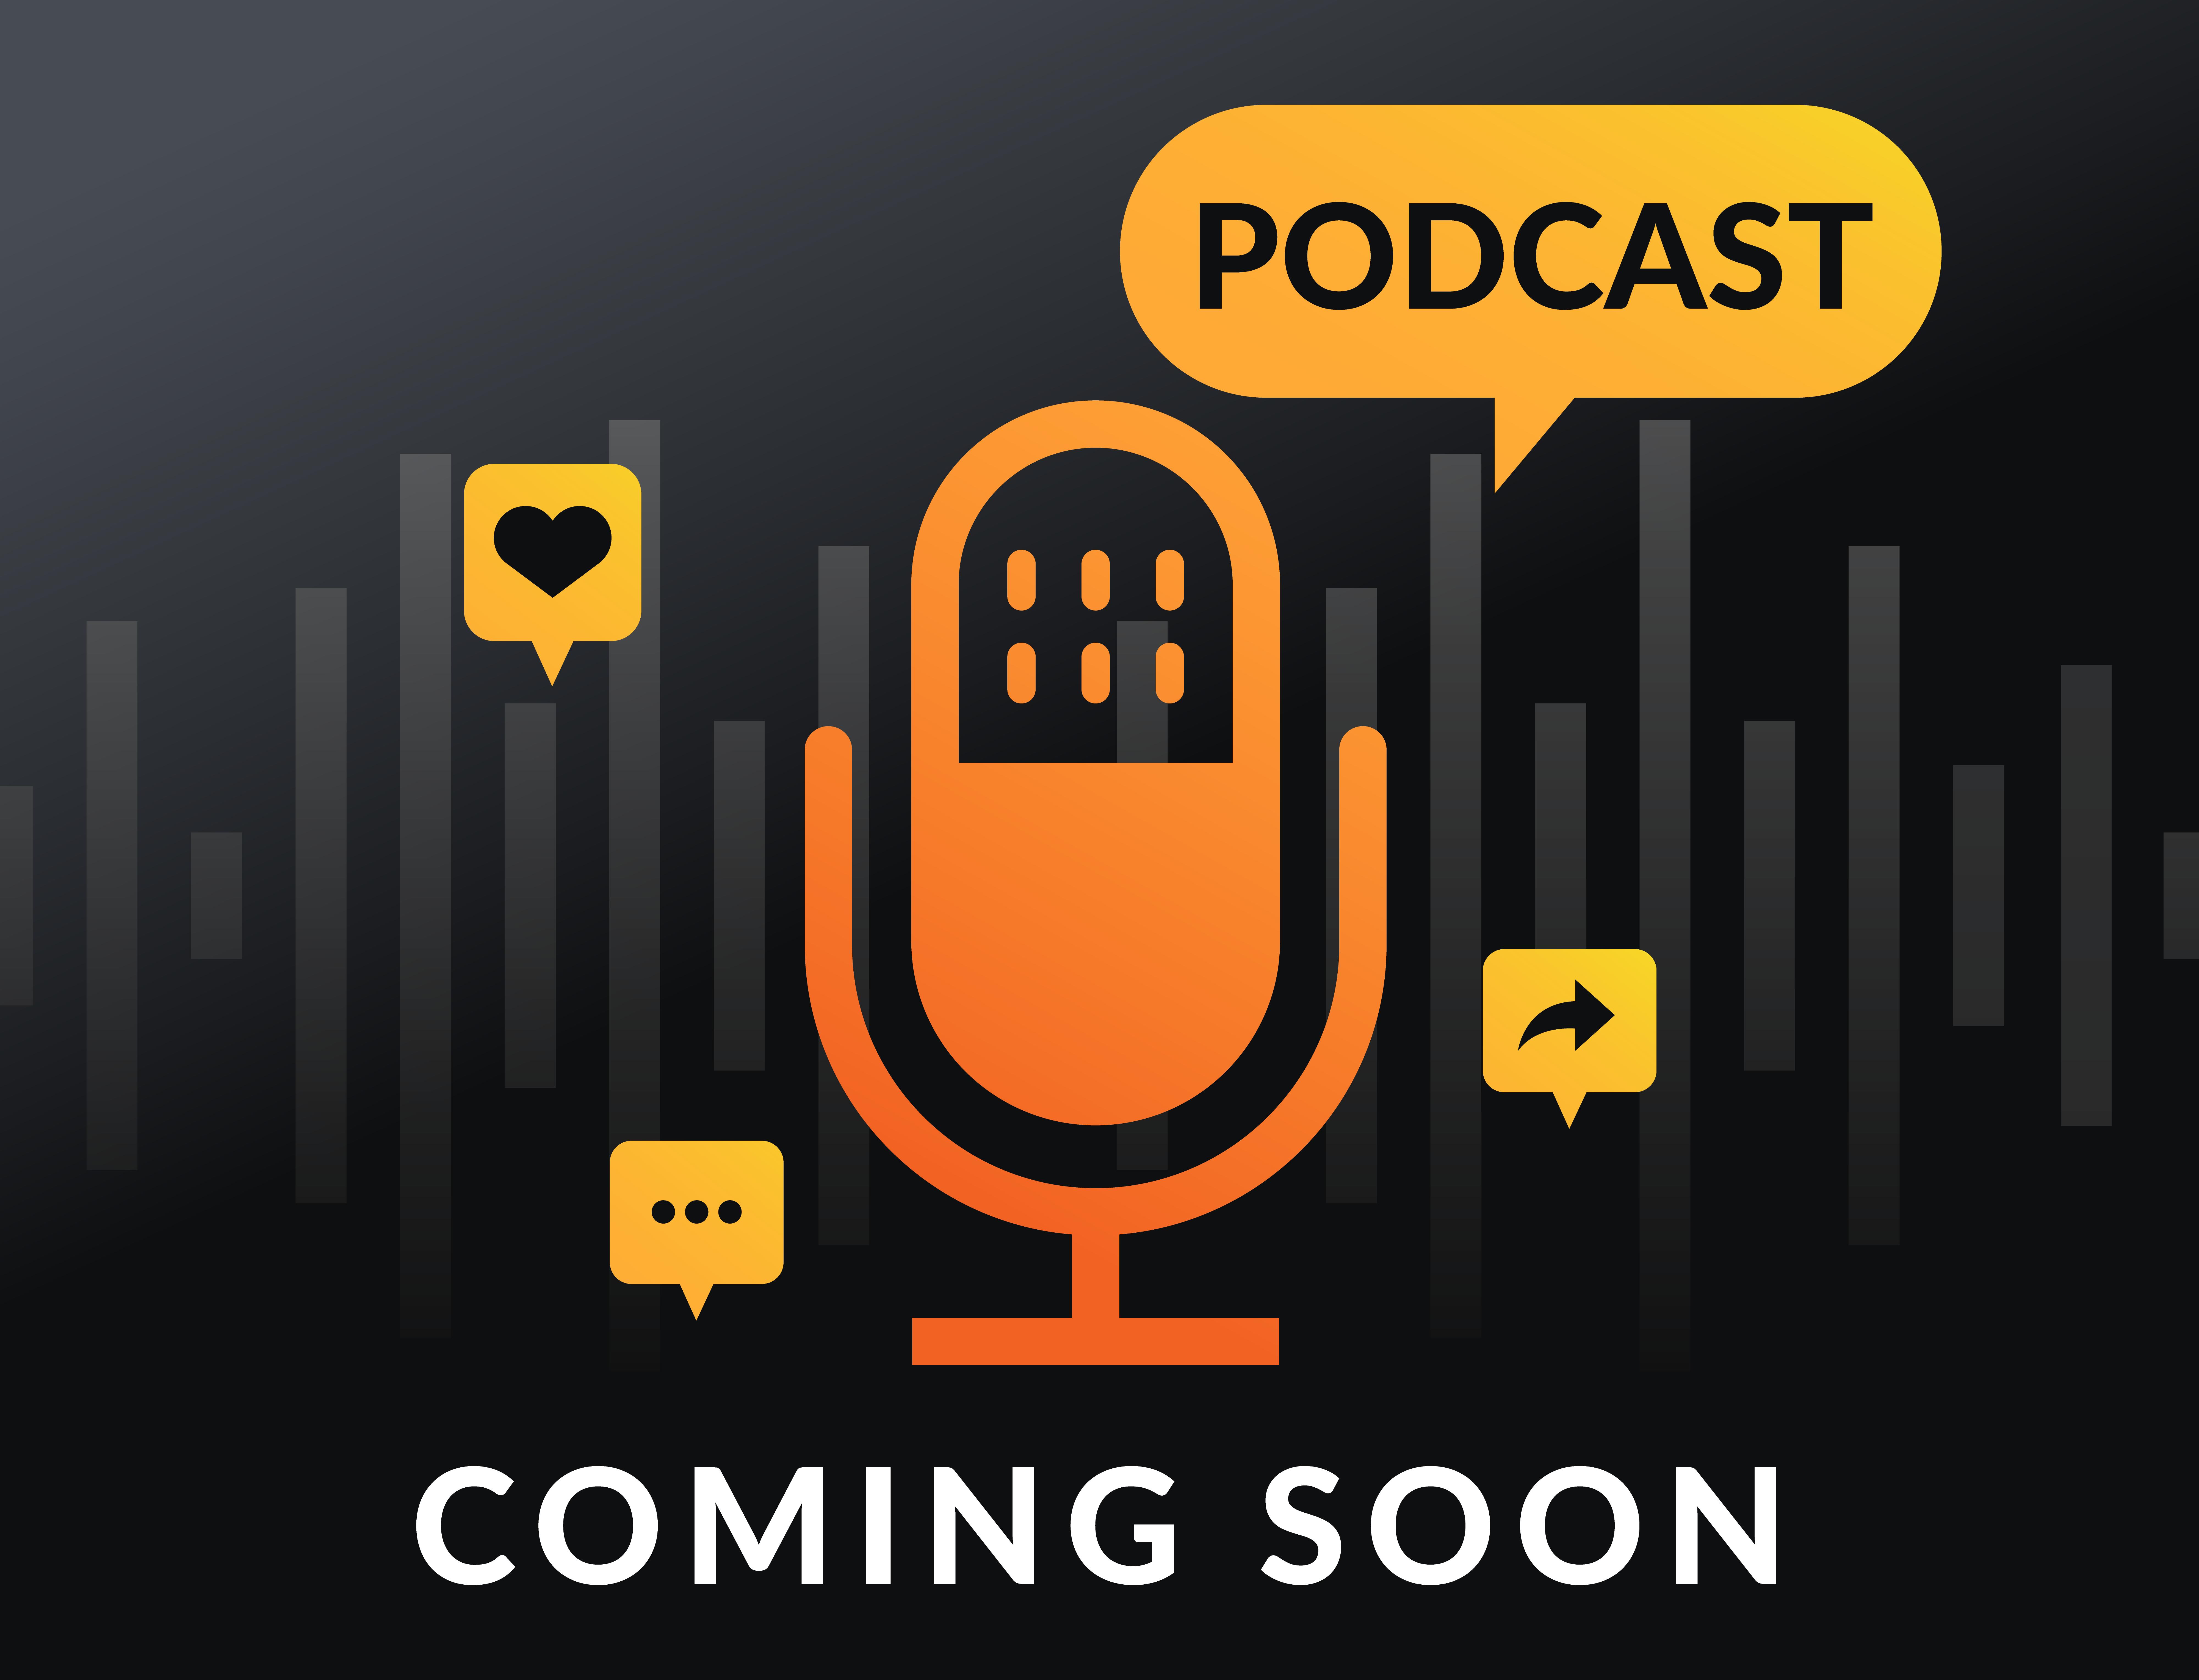 PodcastComingSoon